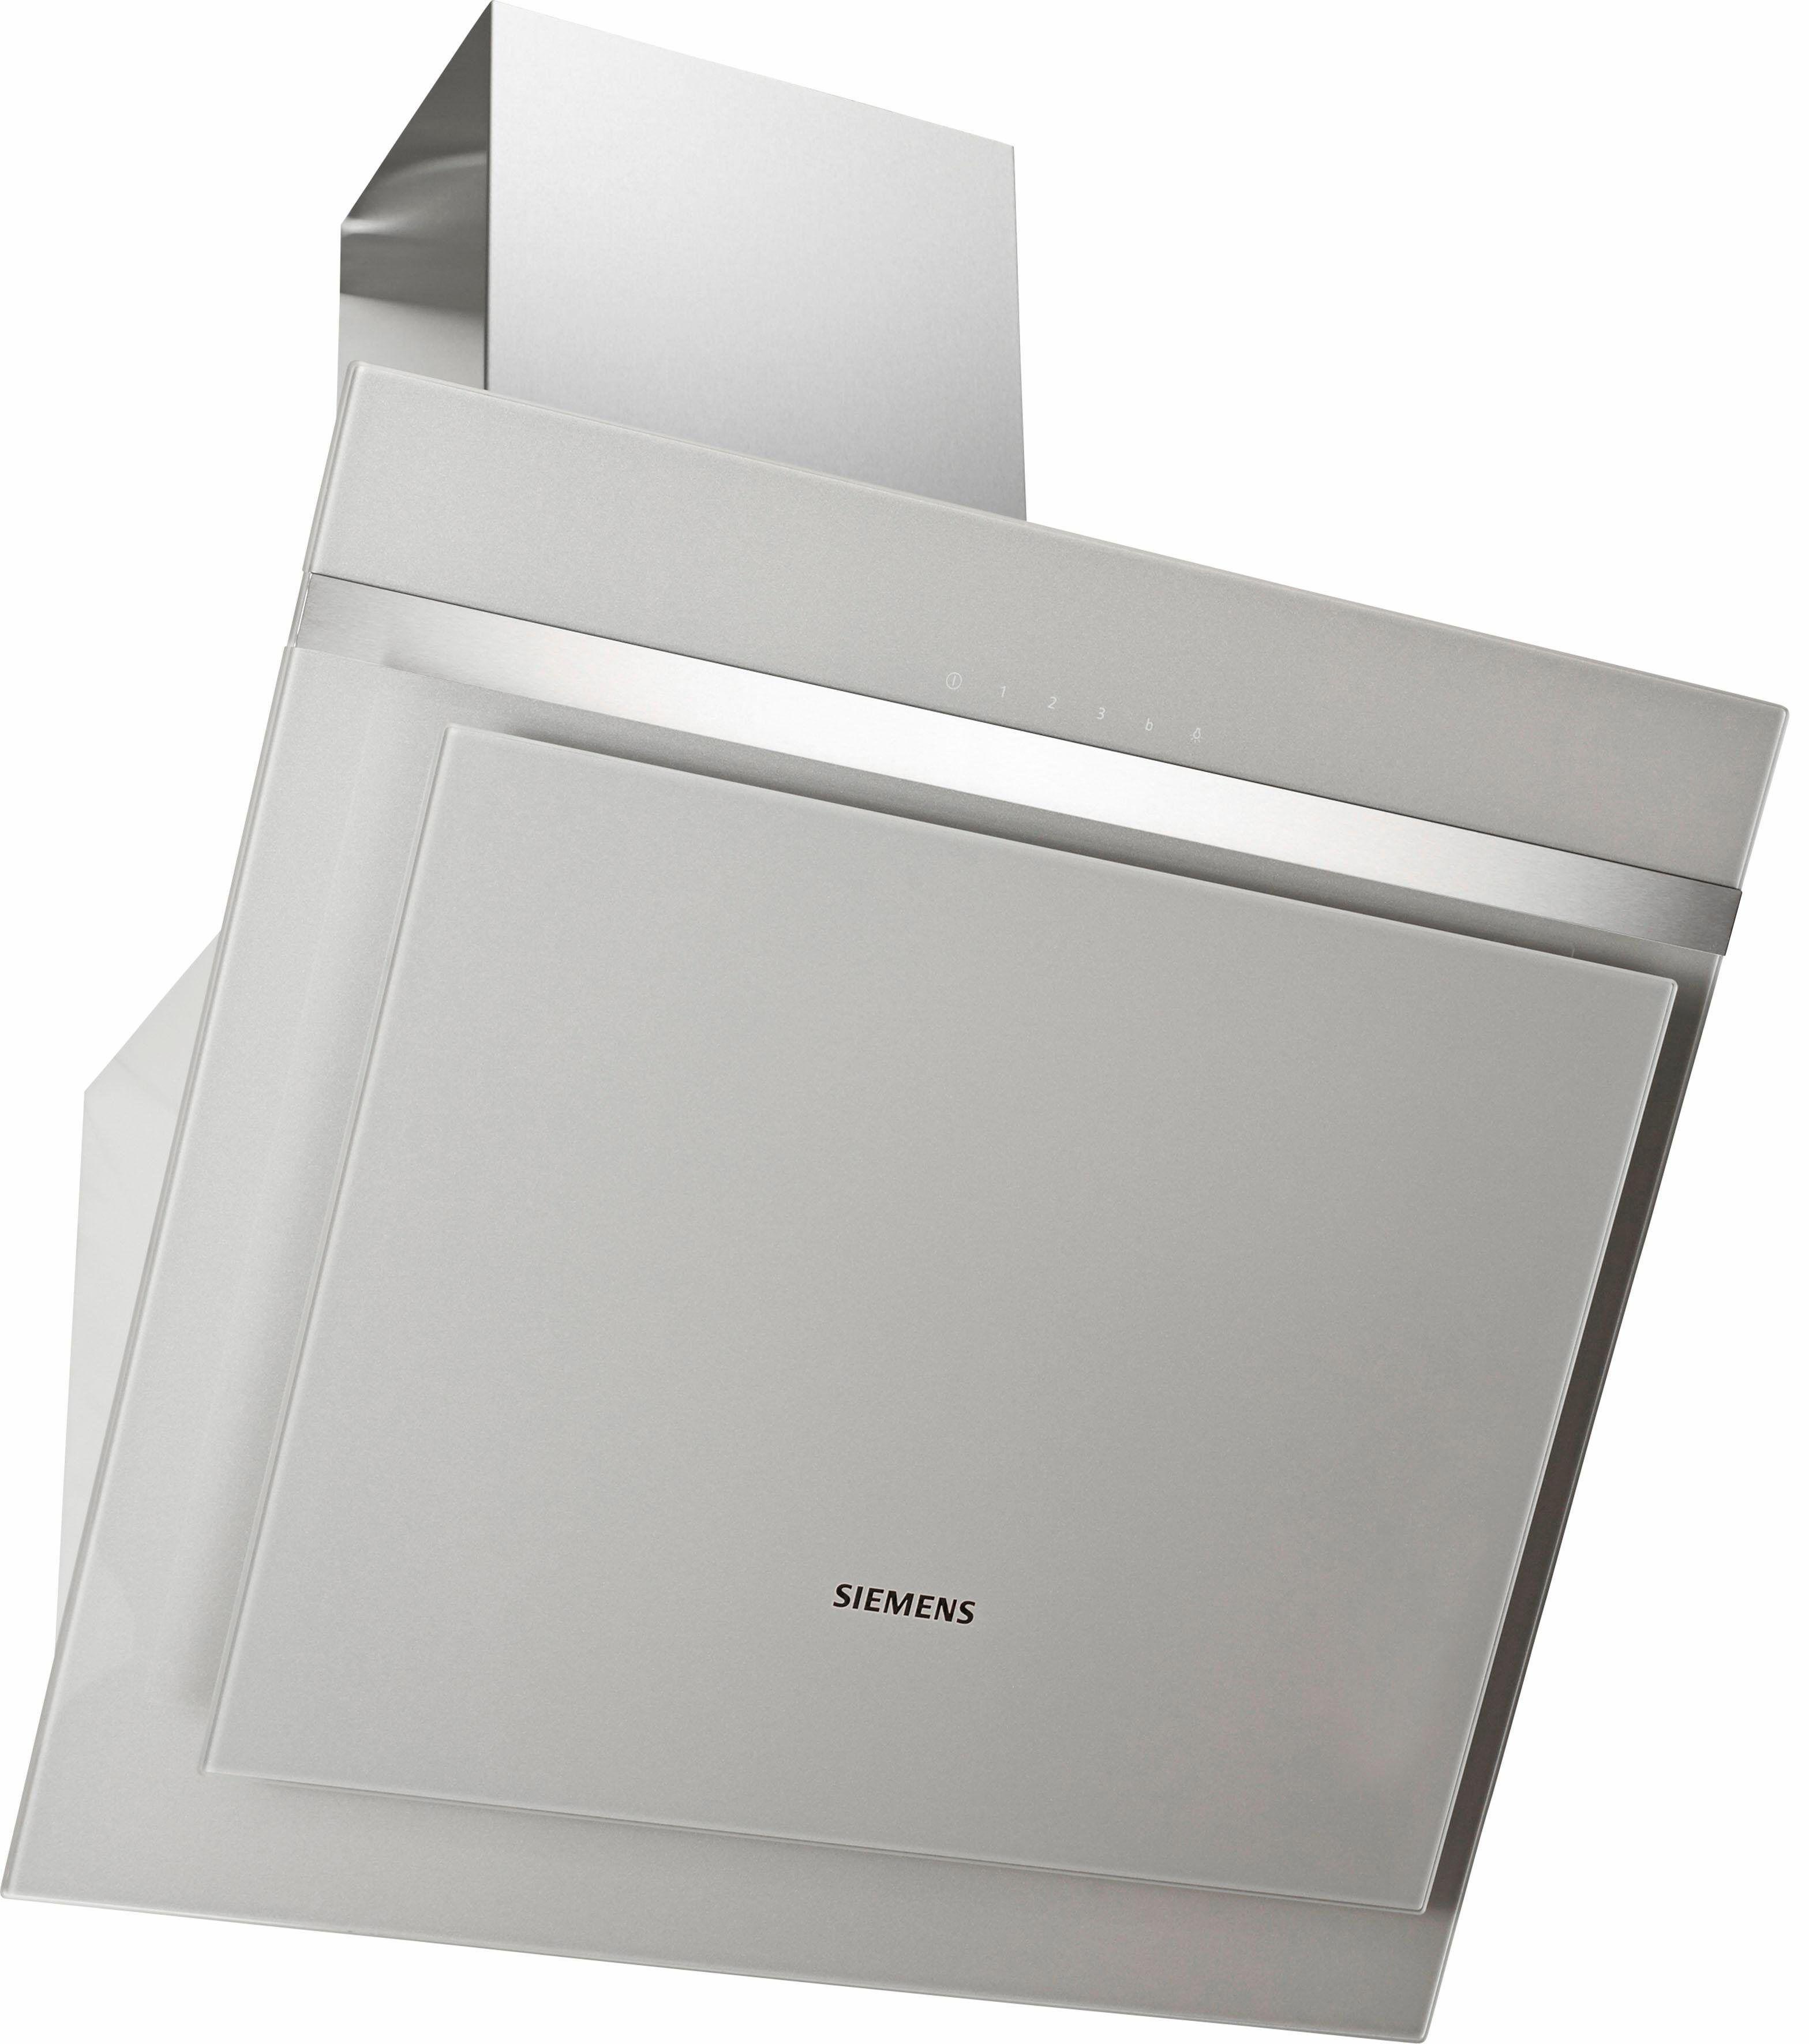 Siemens Kopffreihaube Serie iQ300 LC67KHM10, Energieeffizienzklasse A